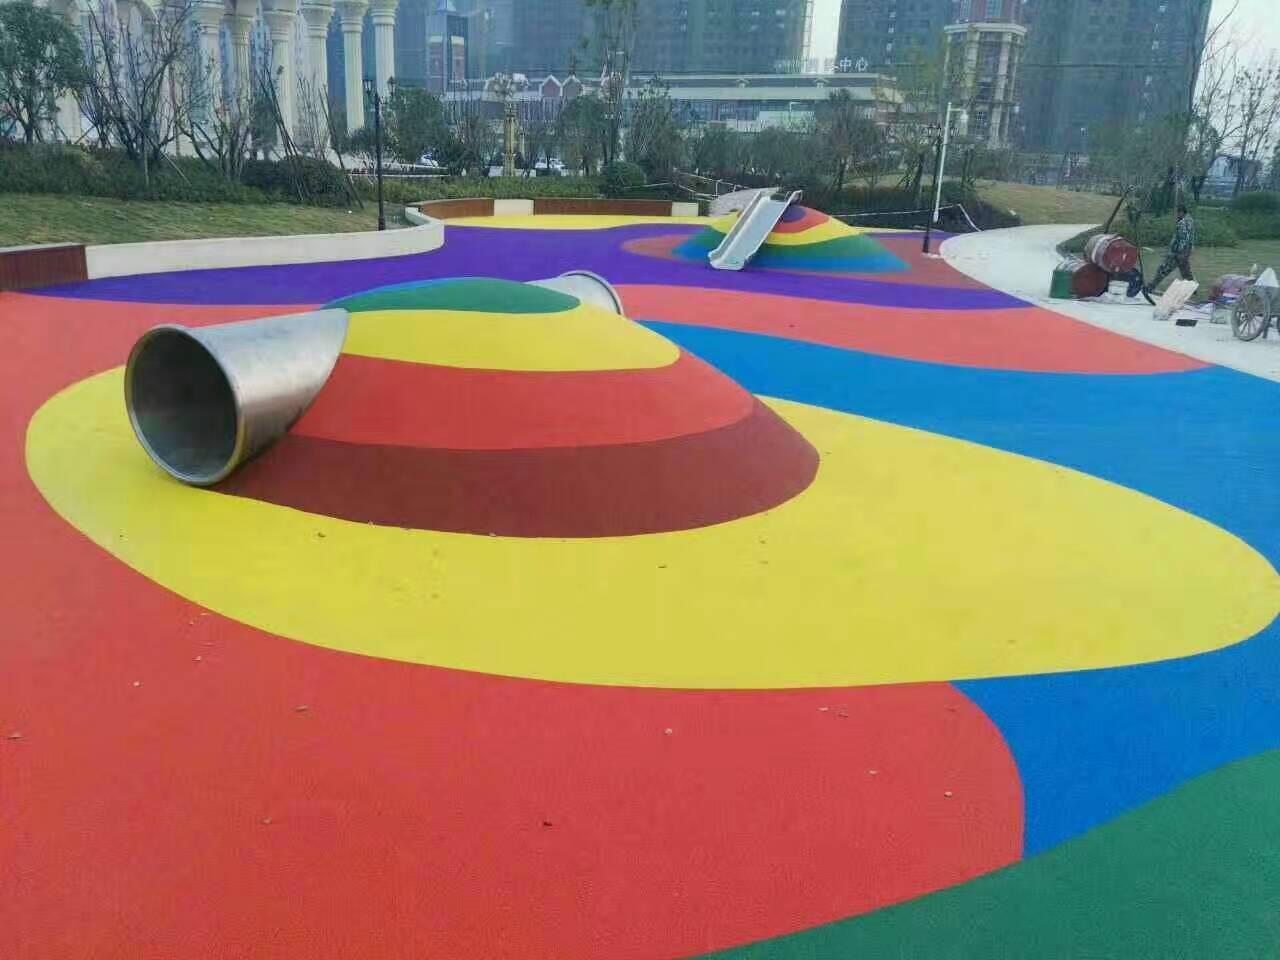 EPDM塑胶球场特点 想买满意的EPDM塑胶球场就到广州博华体育